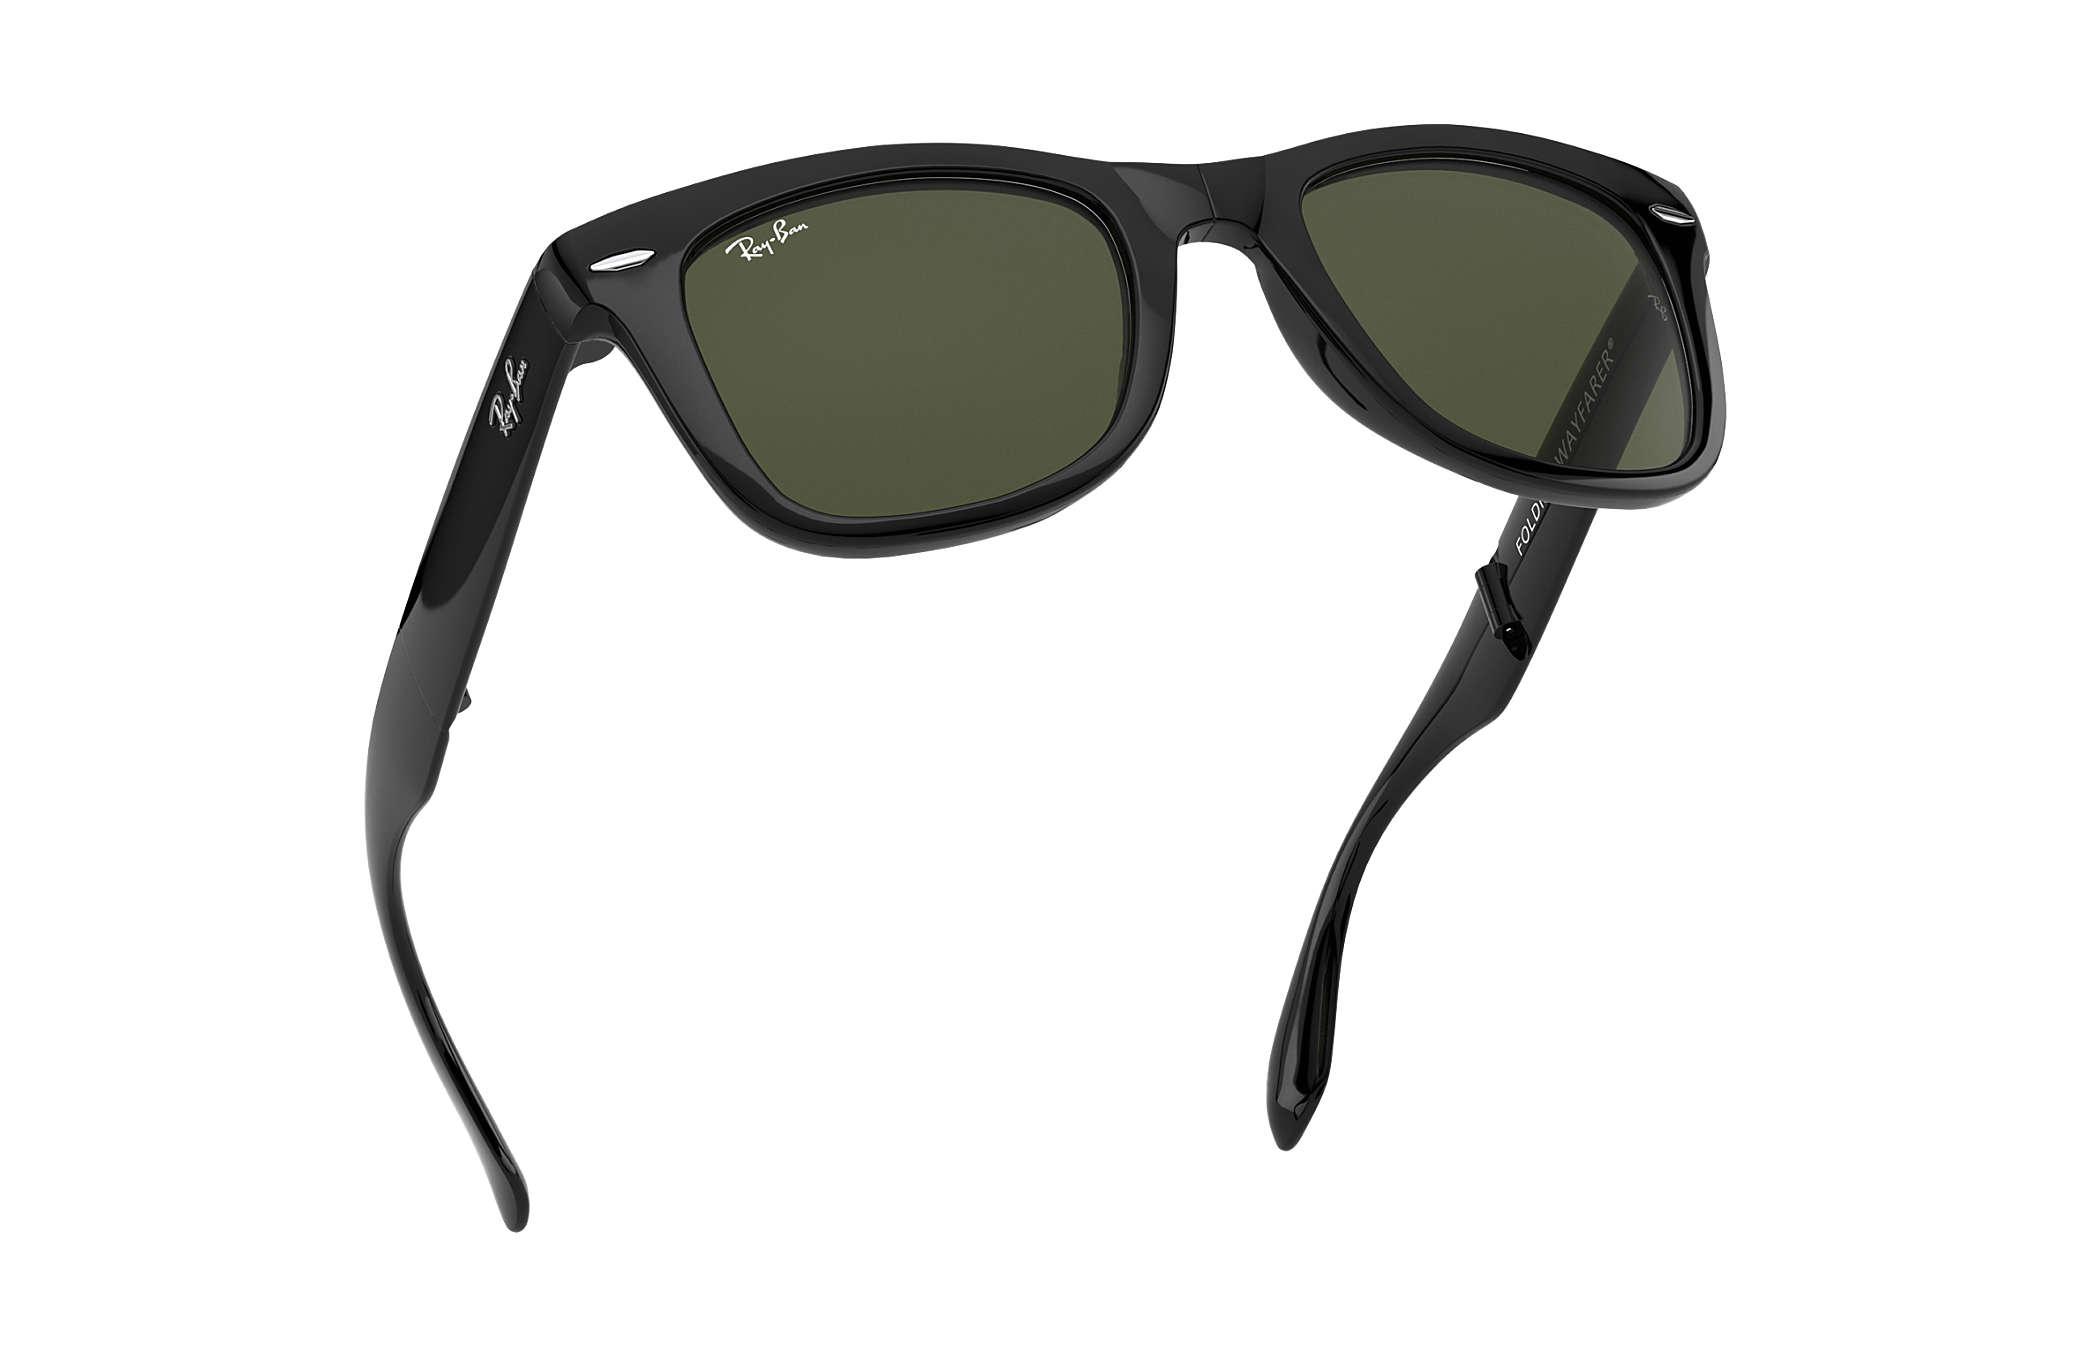 Ray ban sunglasses with price - Ray Ban 0rb4105 Wayfarer Folding Classic Black Sun